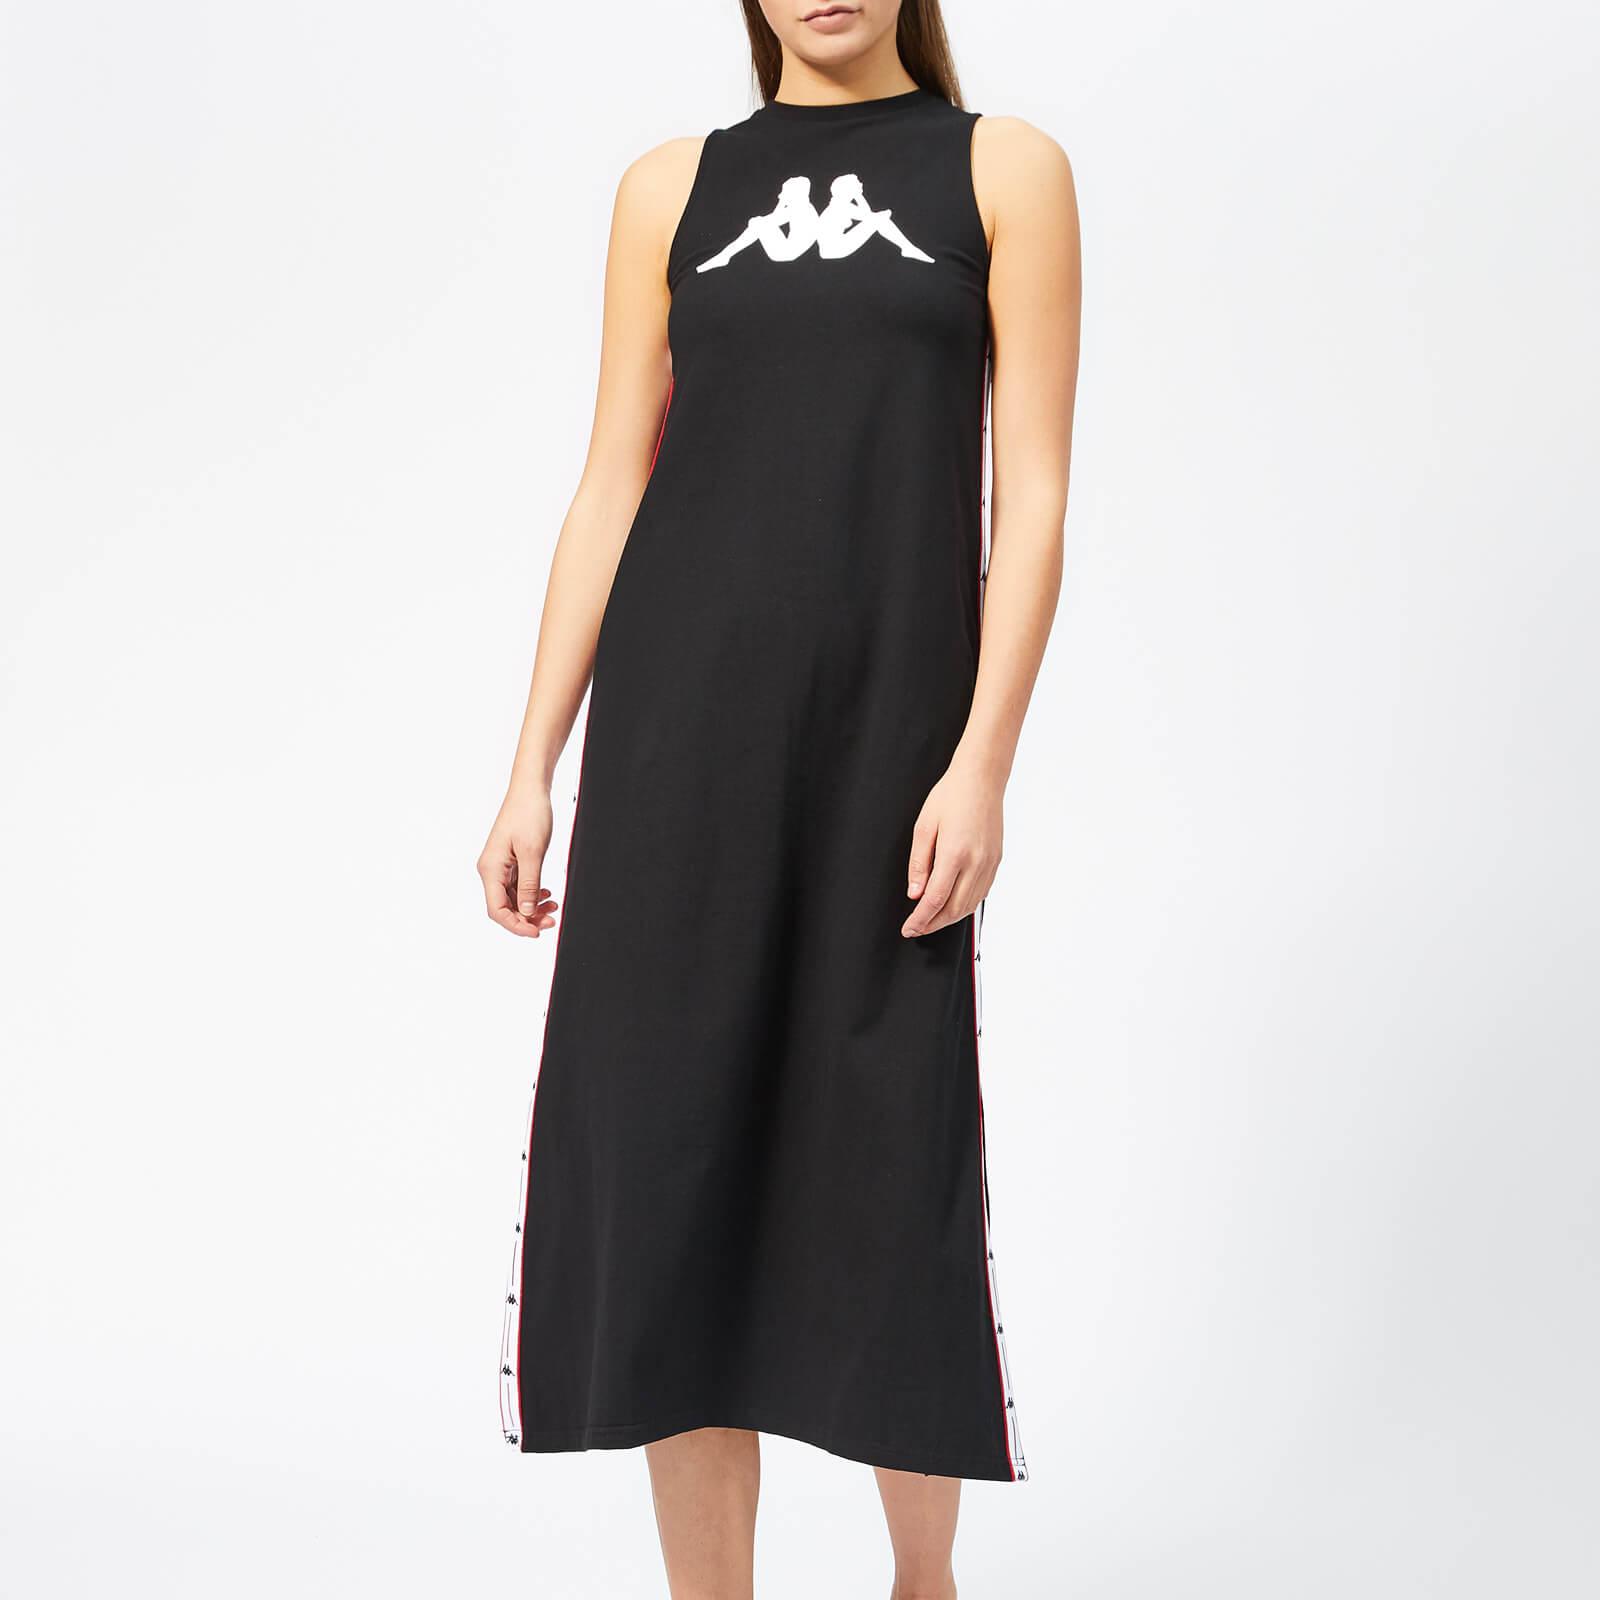 Kappa Women's Authentic Japan Banoy Dress - Black - XS - Black